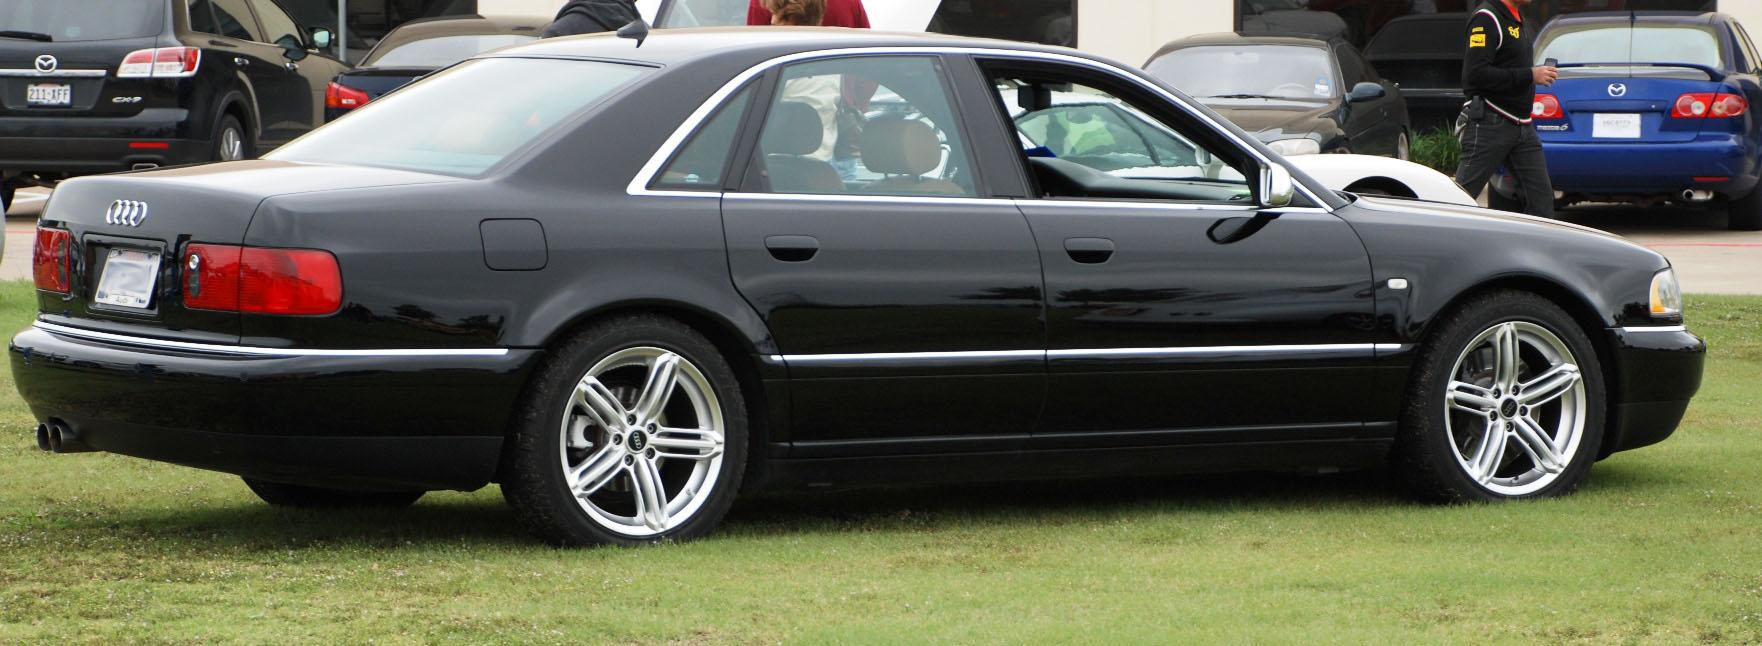 2003 Audi S8 Image 24